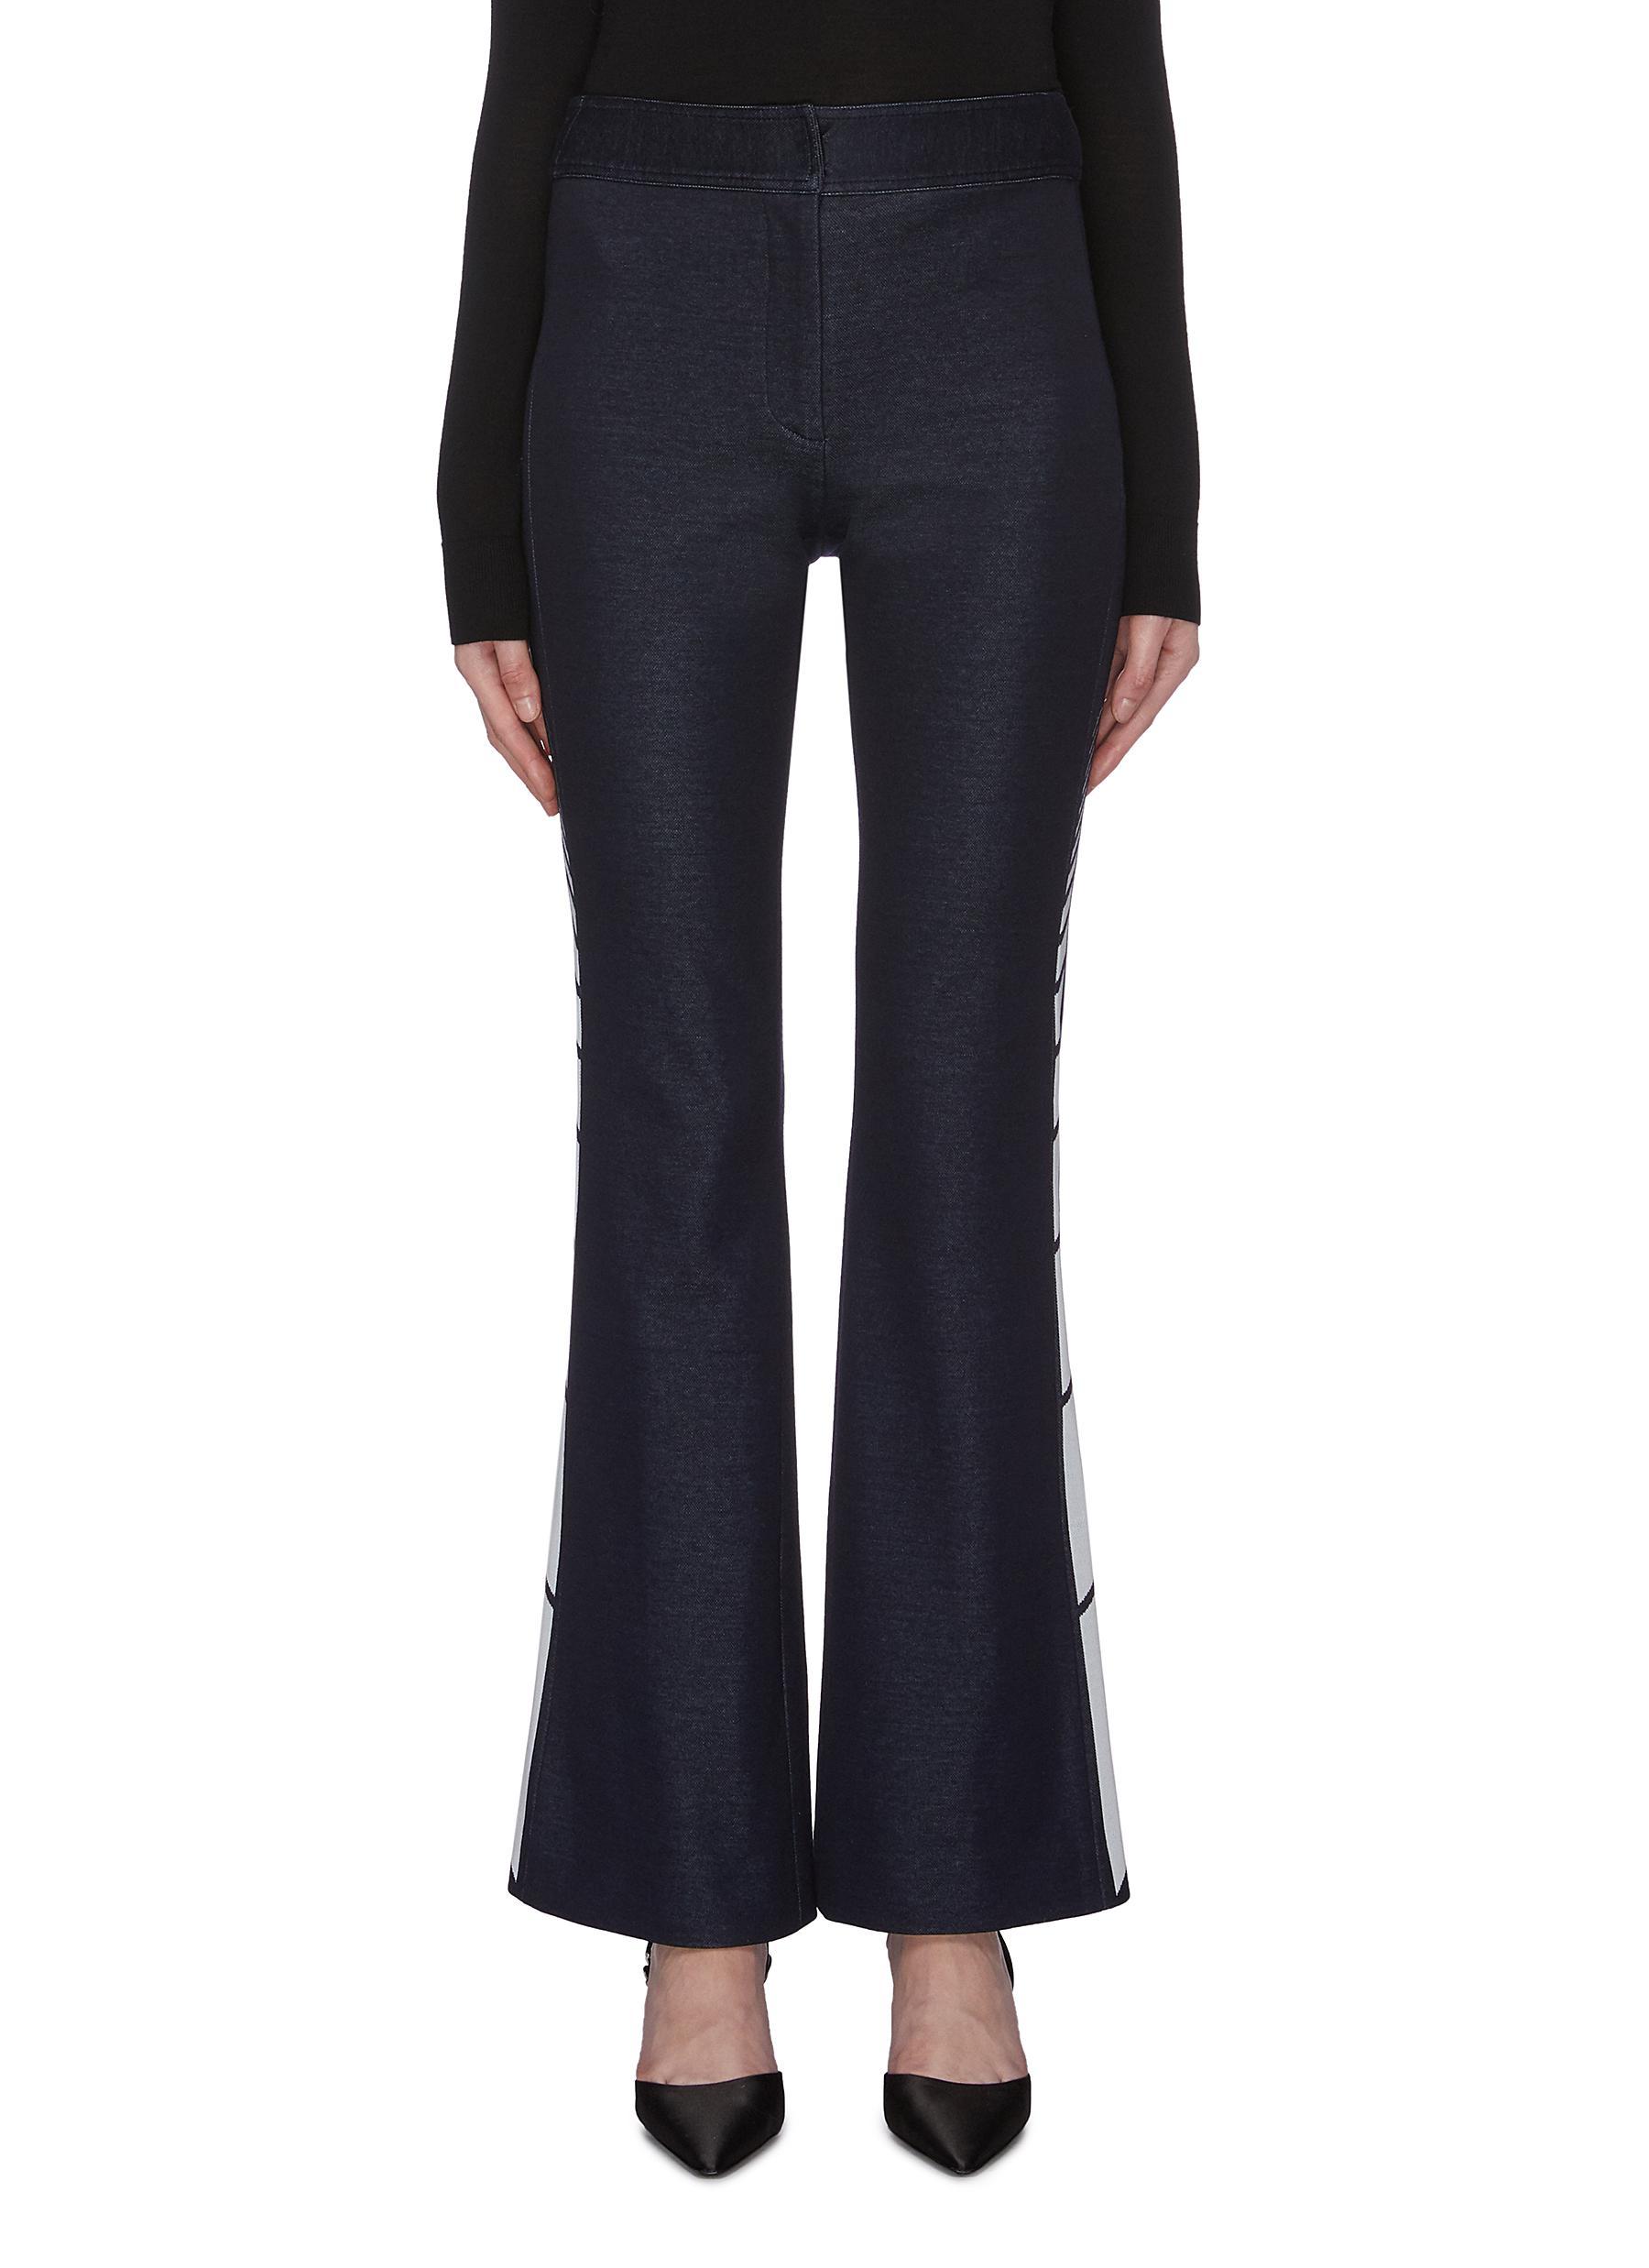 Zip cuff stripe jacquard outseam pants by Monse